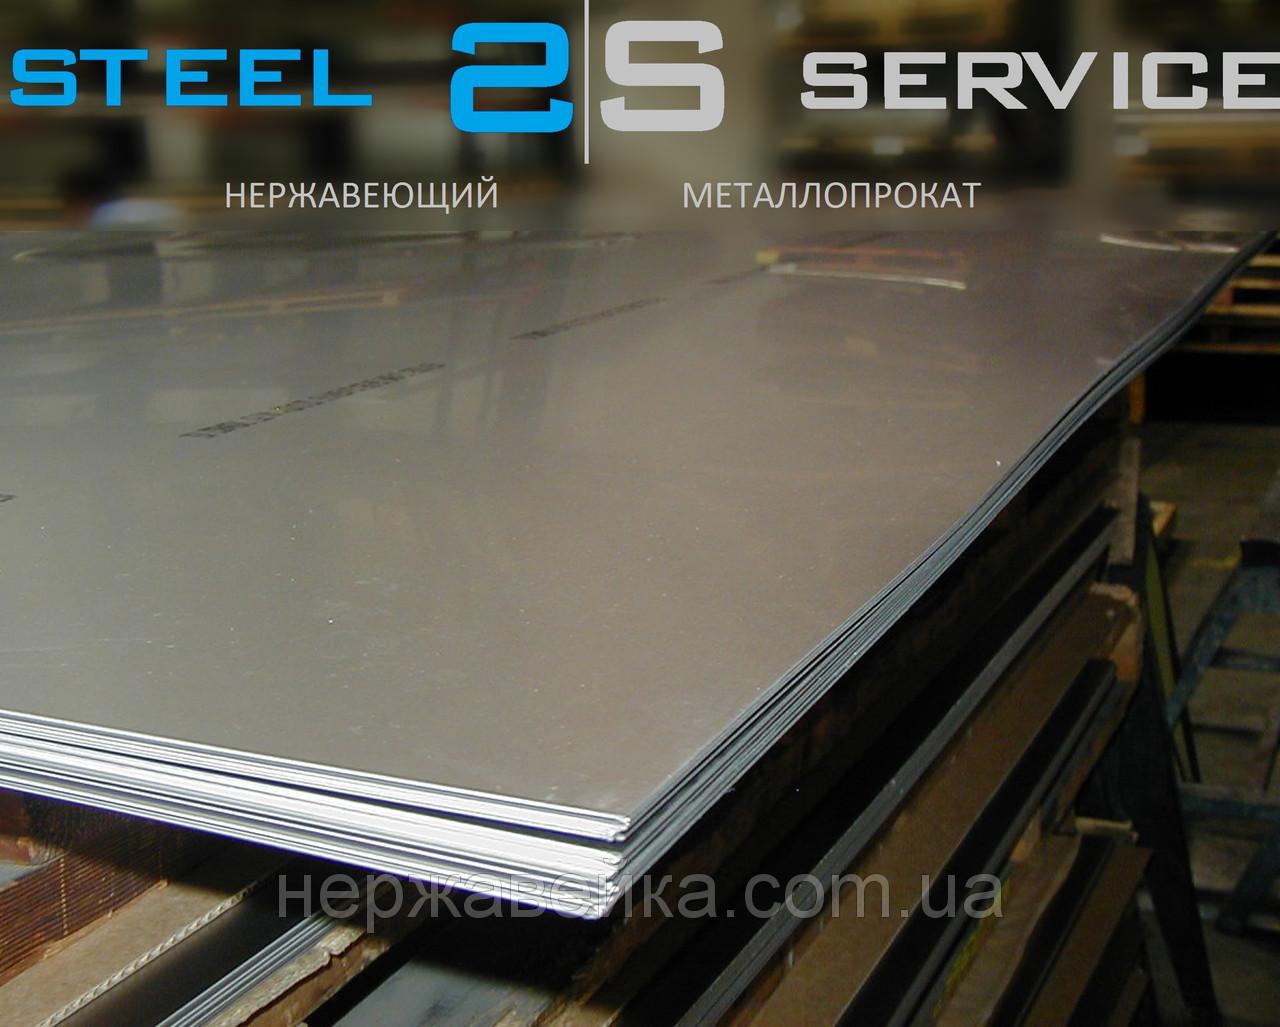 Нержавейка лист 5х1500х3000мм  AISI 316Ti(10Х17Н13М2Т) F1 - горячекатанный,  кислотостойкий